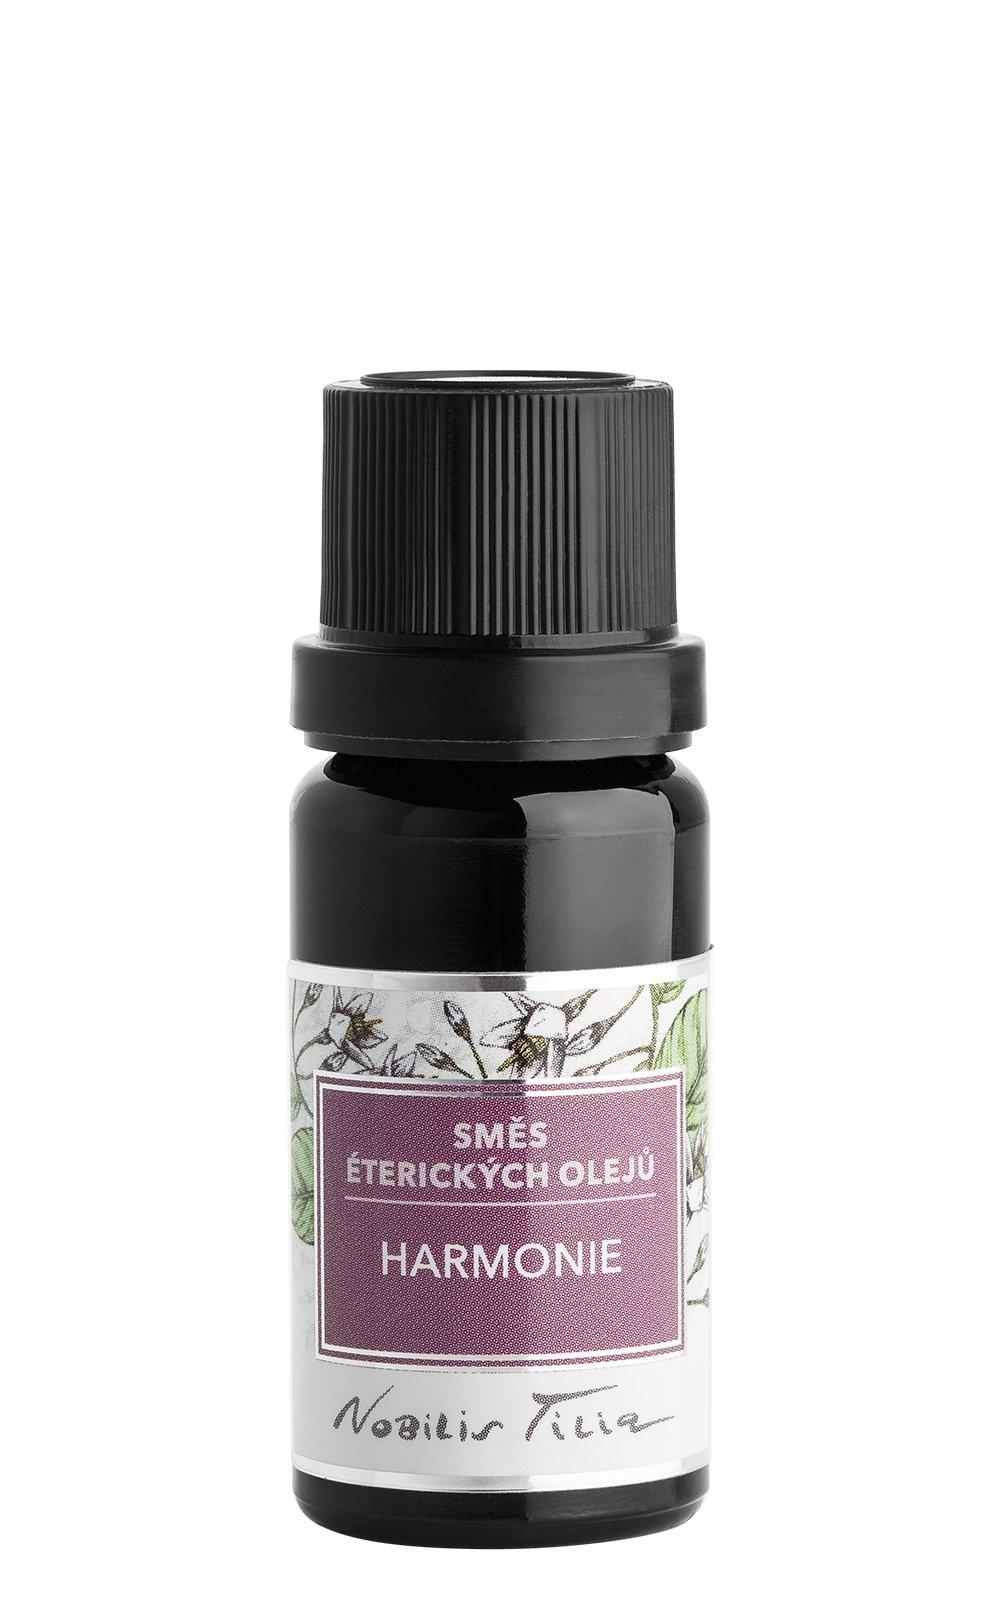 Směs éterických olejů Harmonie: 10 ml